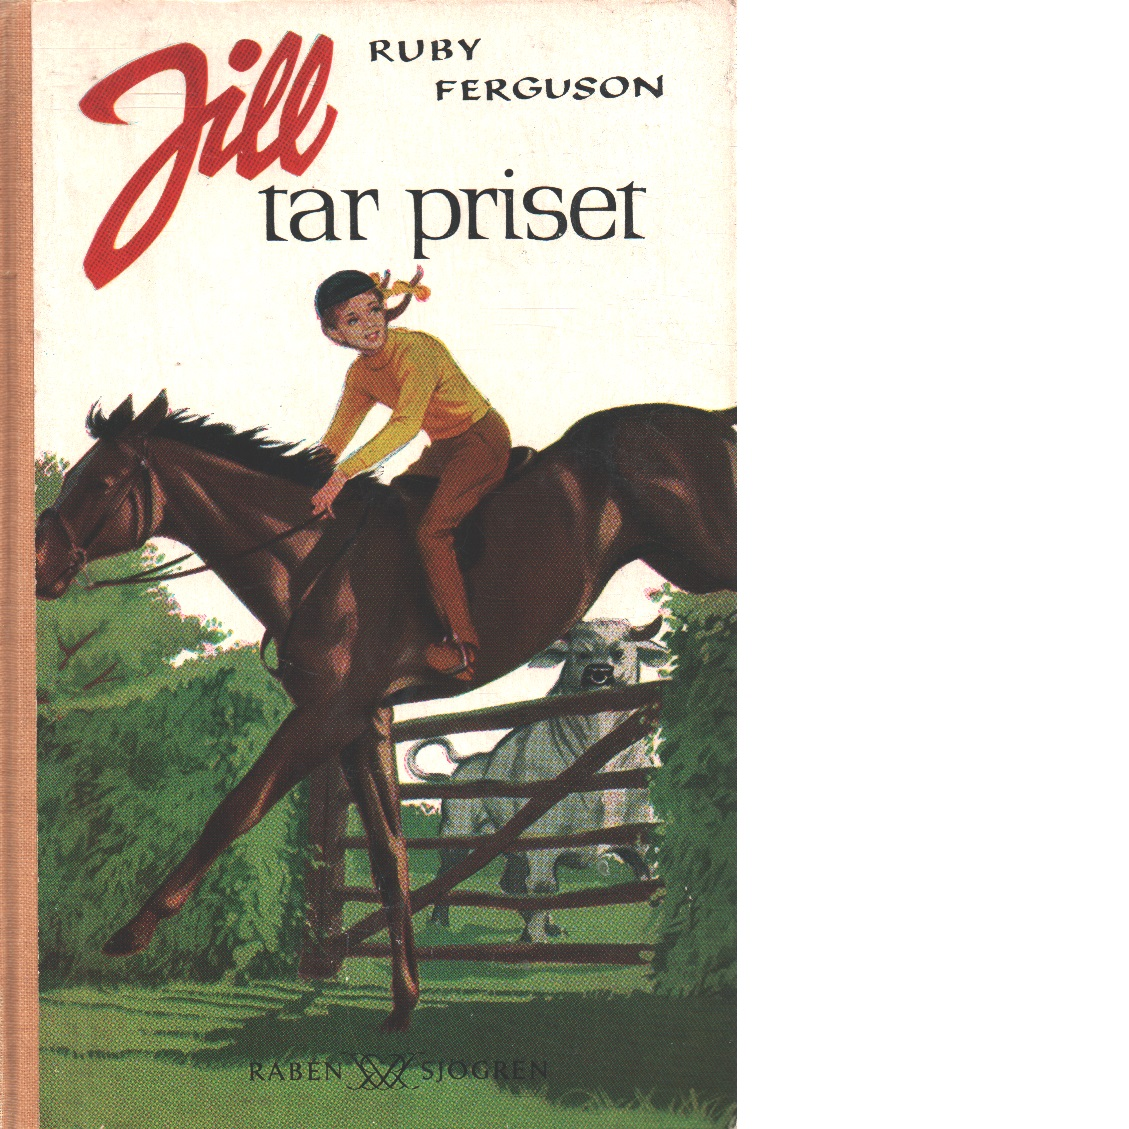 Jill tar priset - Ferguson, Ruby